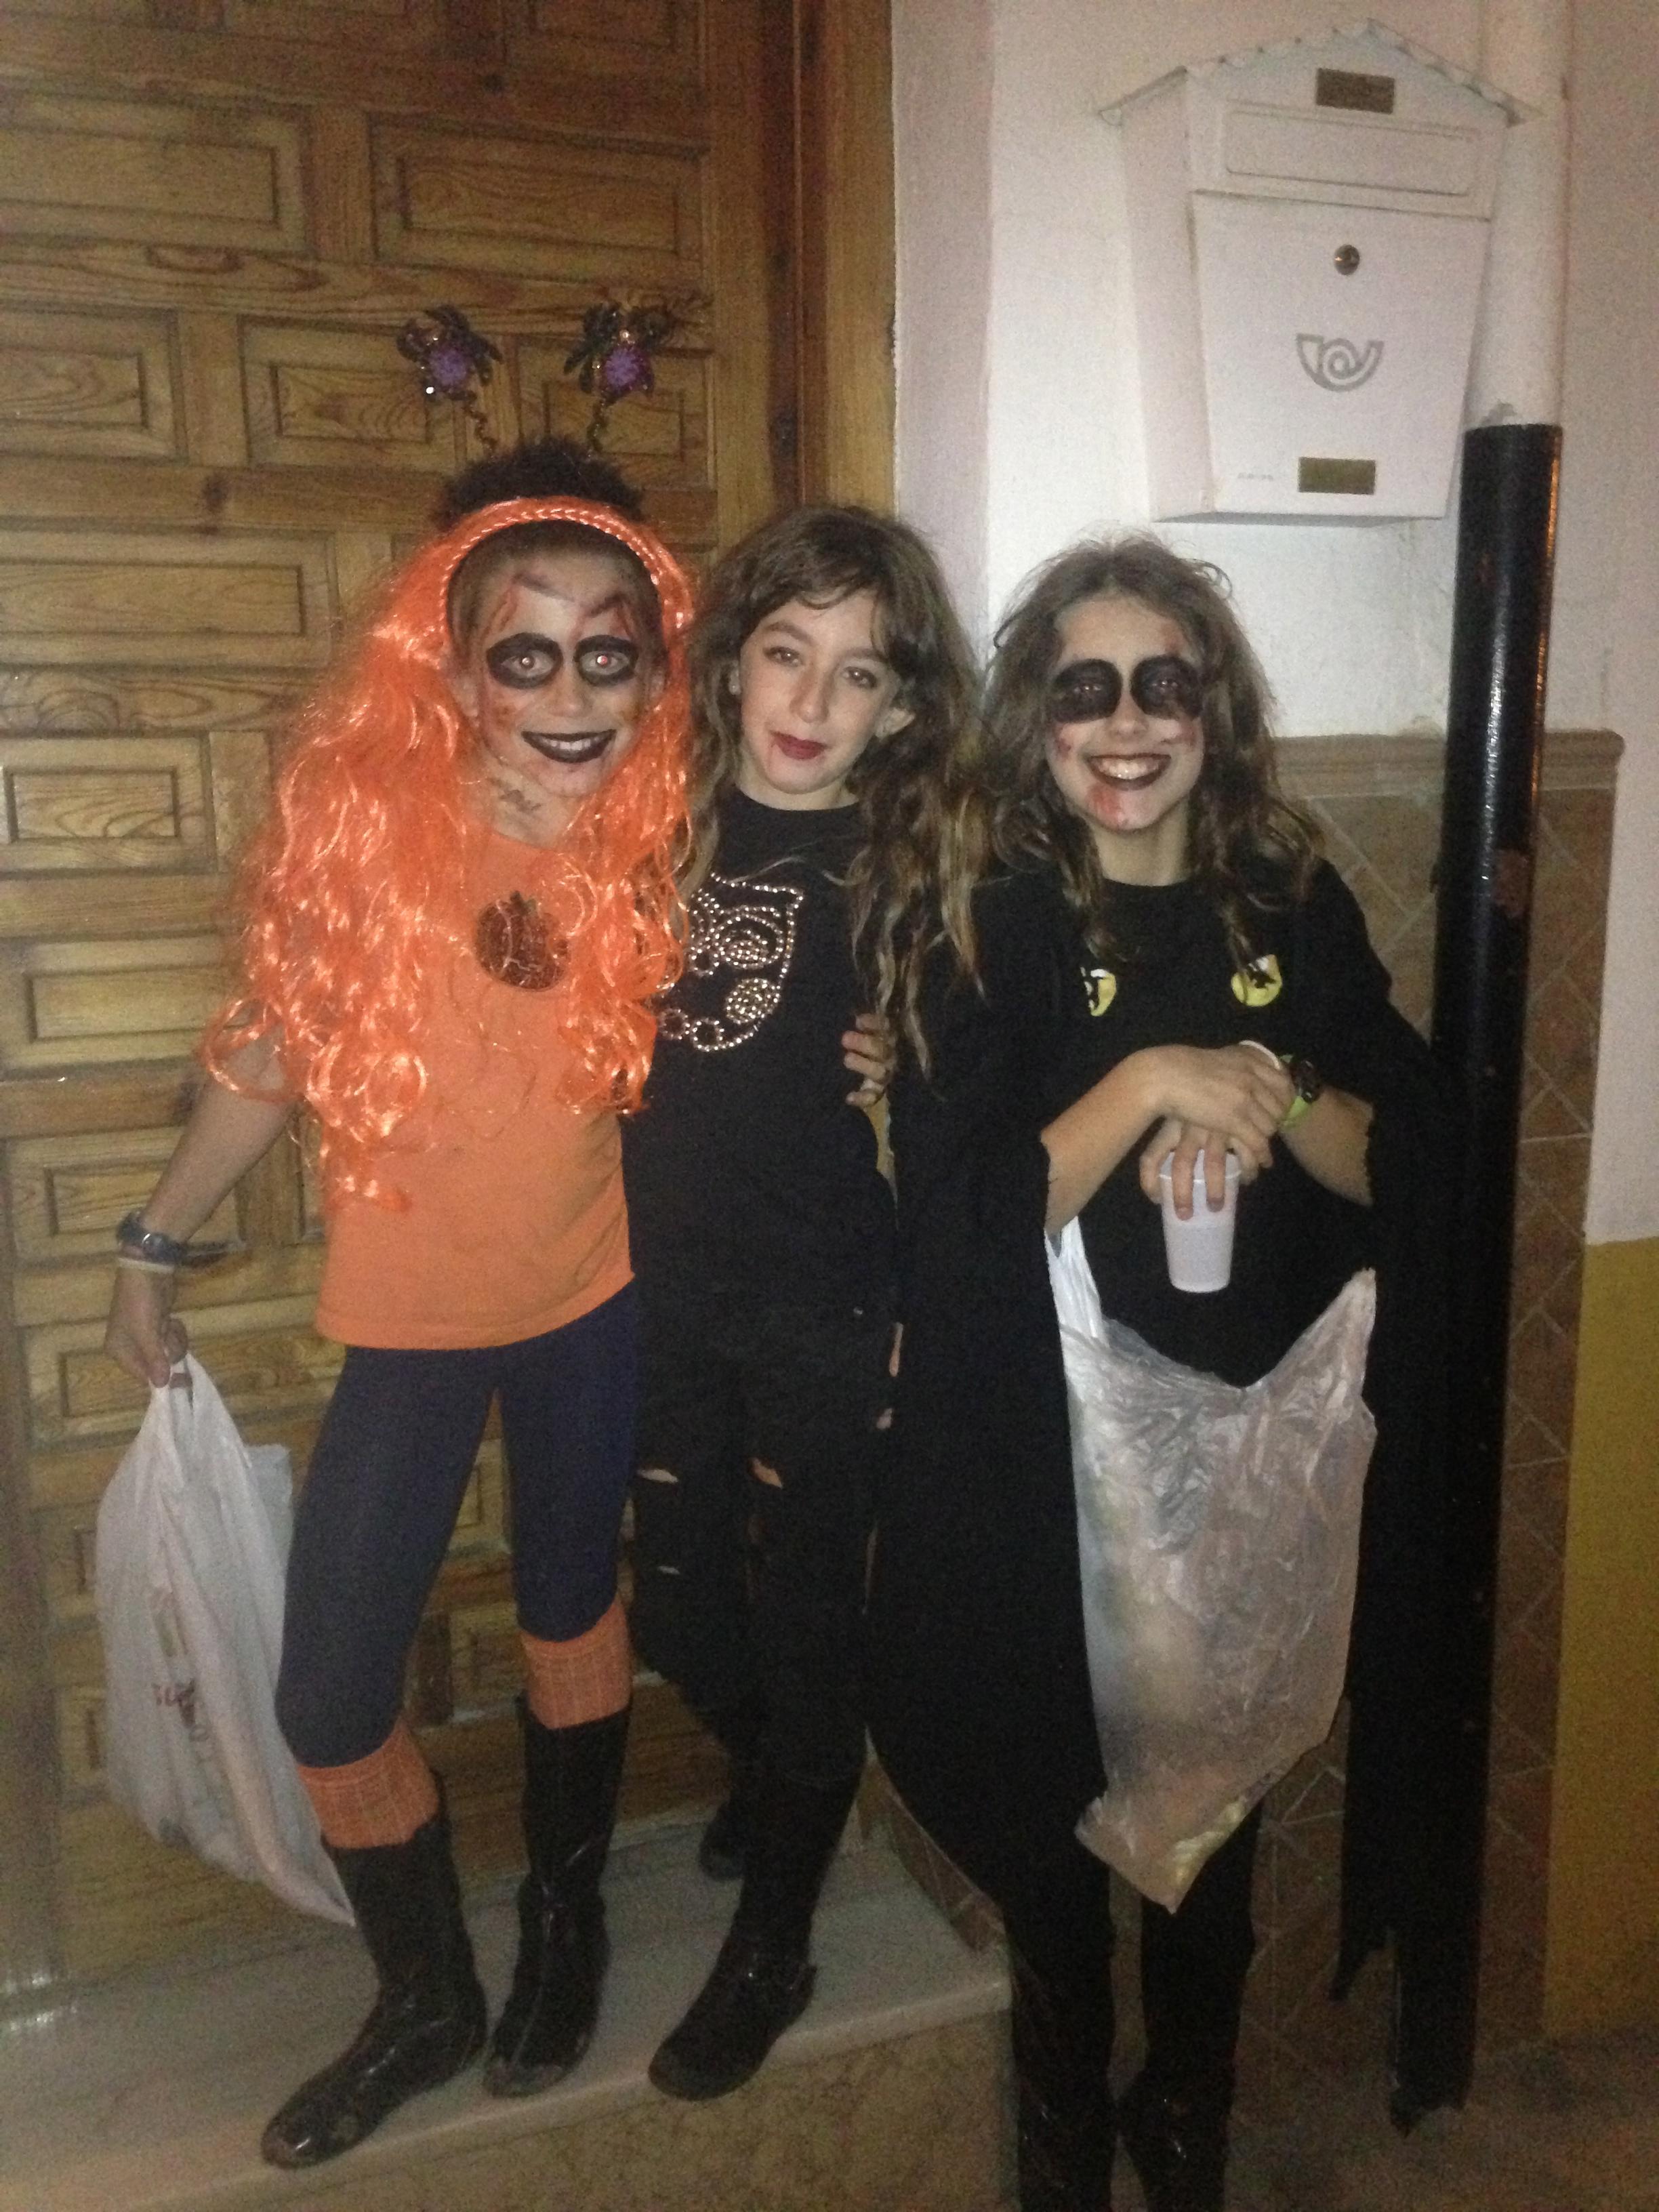 costume | the adventures of team kezmoh